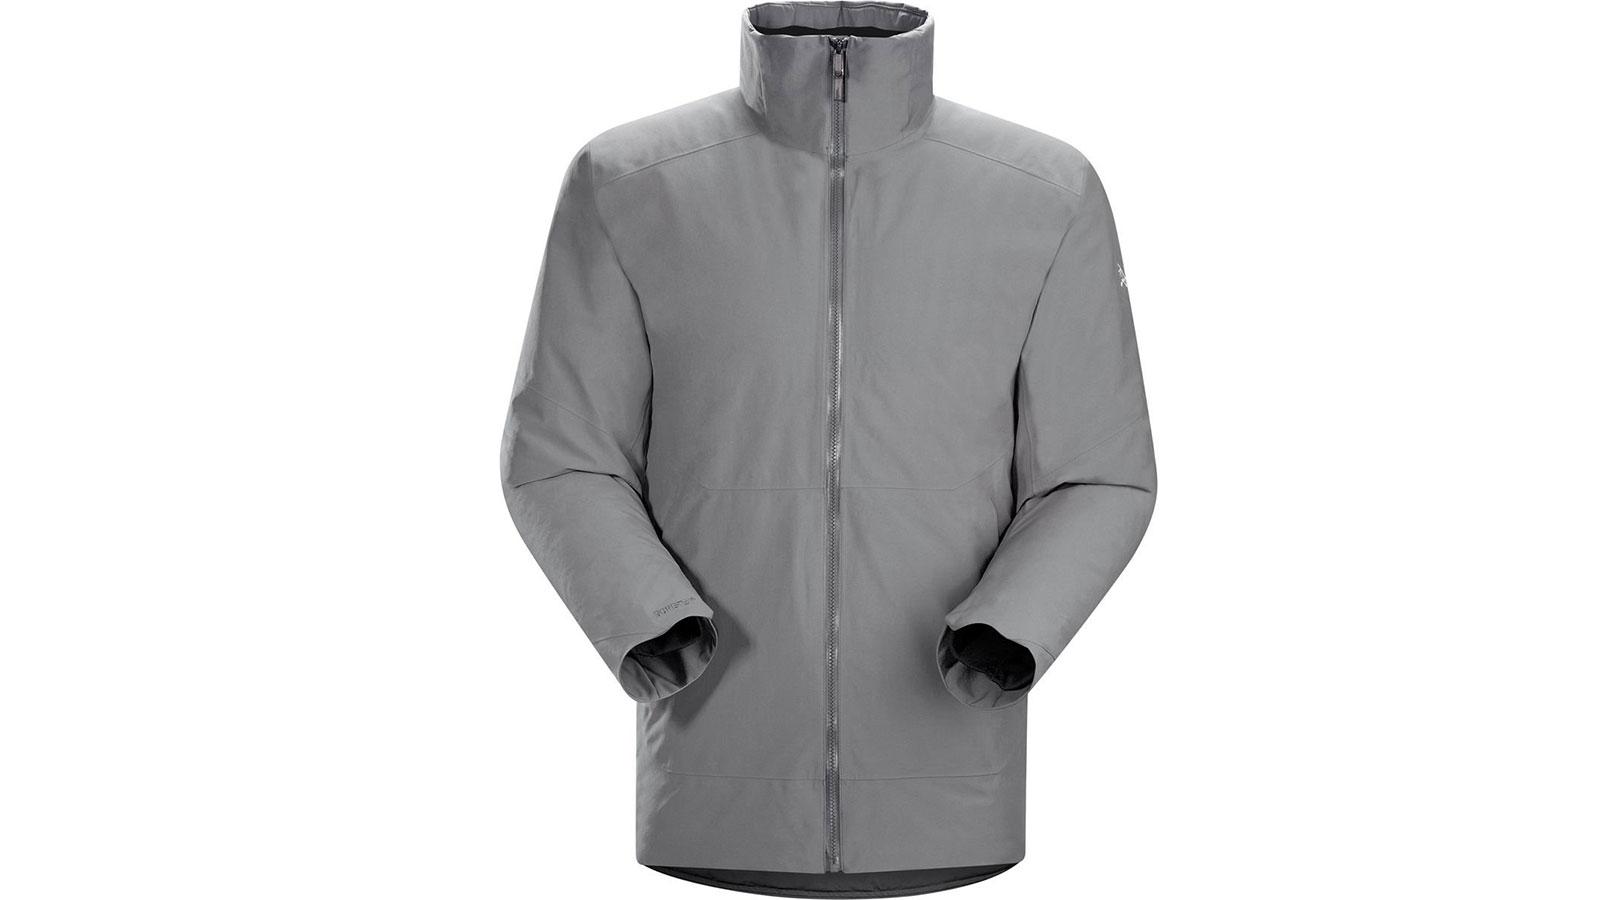 Arc'teryx Camosun Parka Men's Winter Coat | The Best Men's Winter Coats